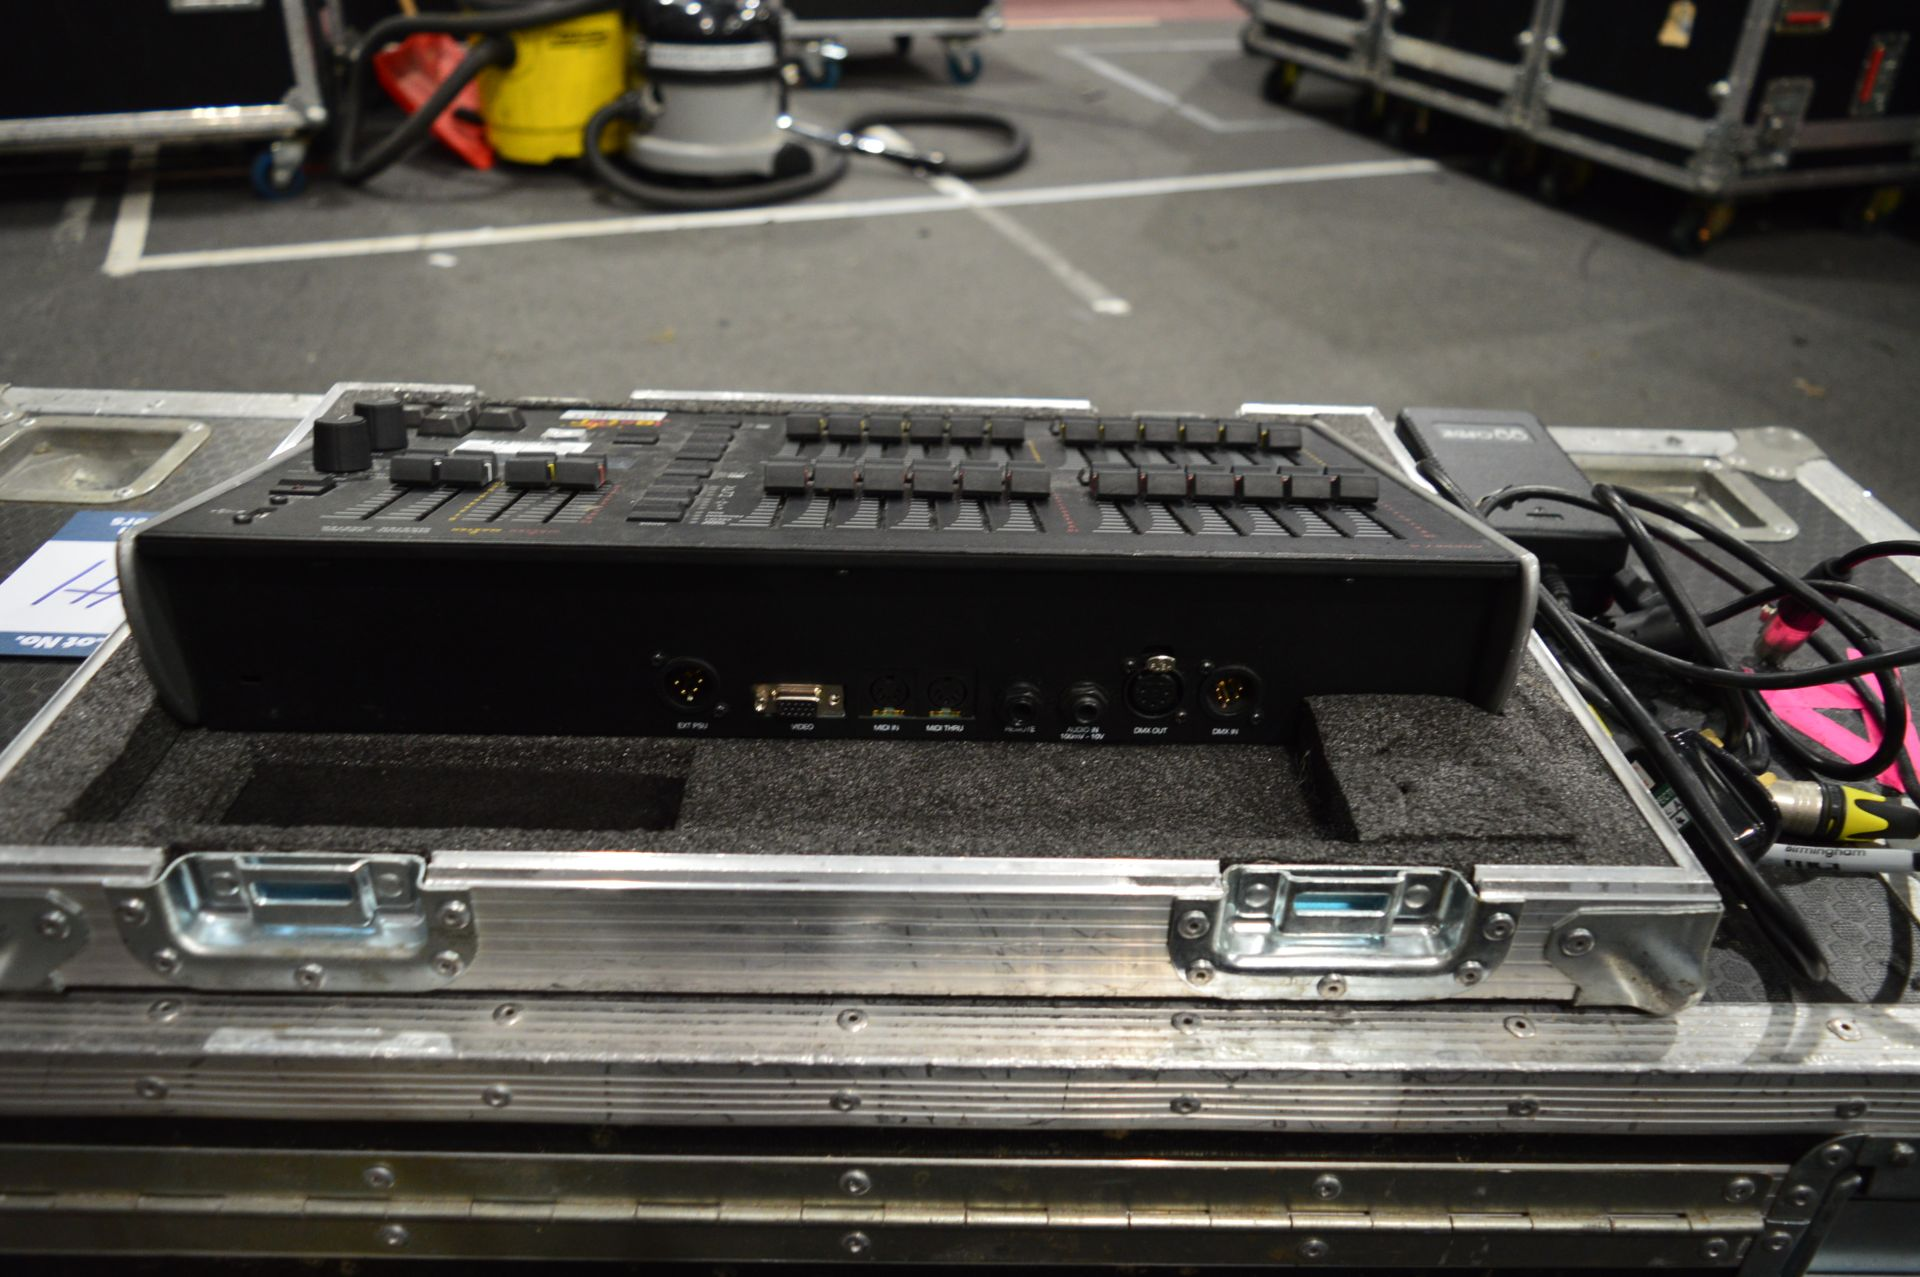 Lot 1041 - Zero88, Jester 12/24 lighting console controller,